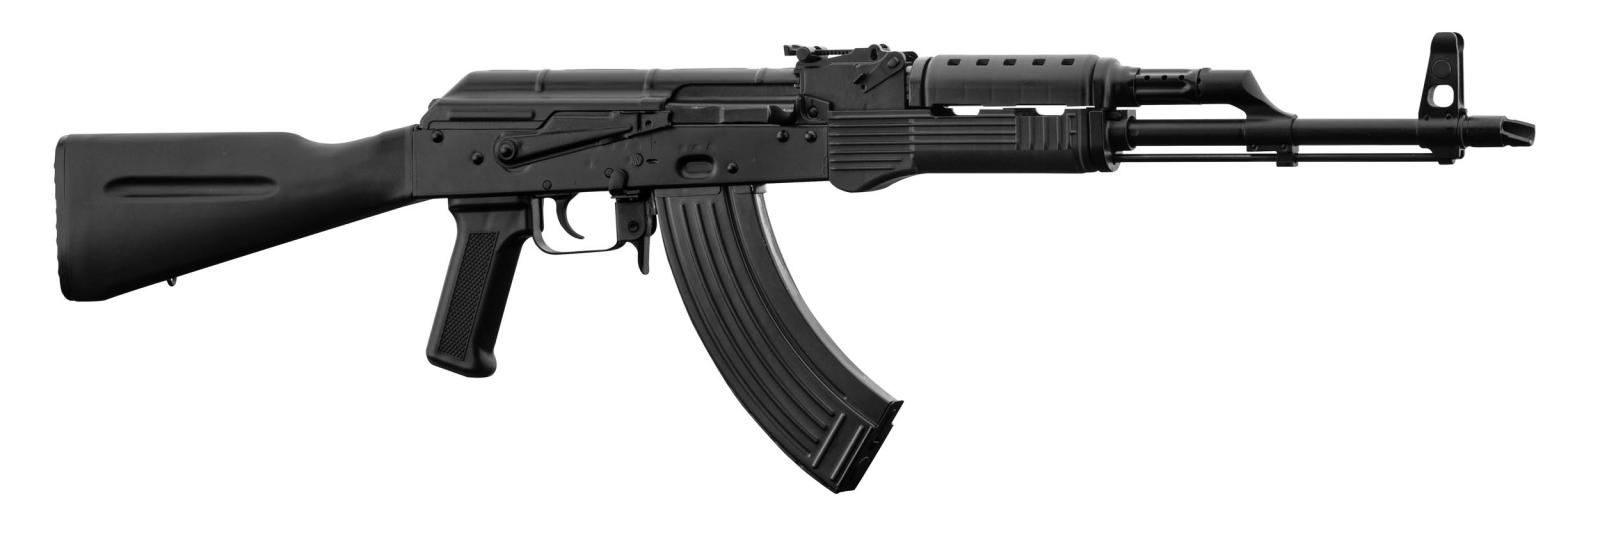 Carabine semi auto K-ARMS (KOLARMS) KA17 Crosse Fixe Cal 7.62x39